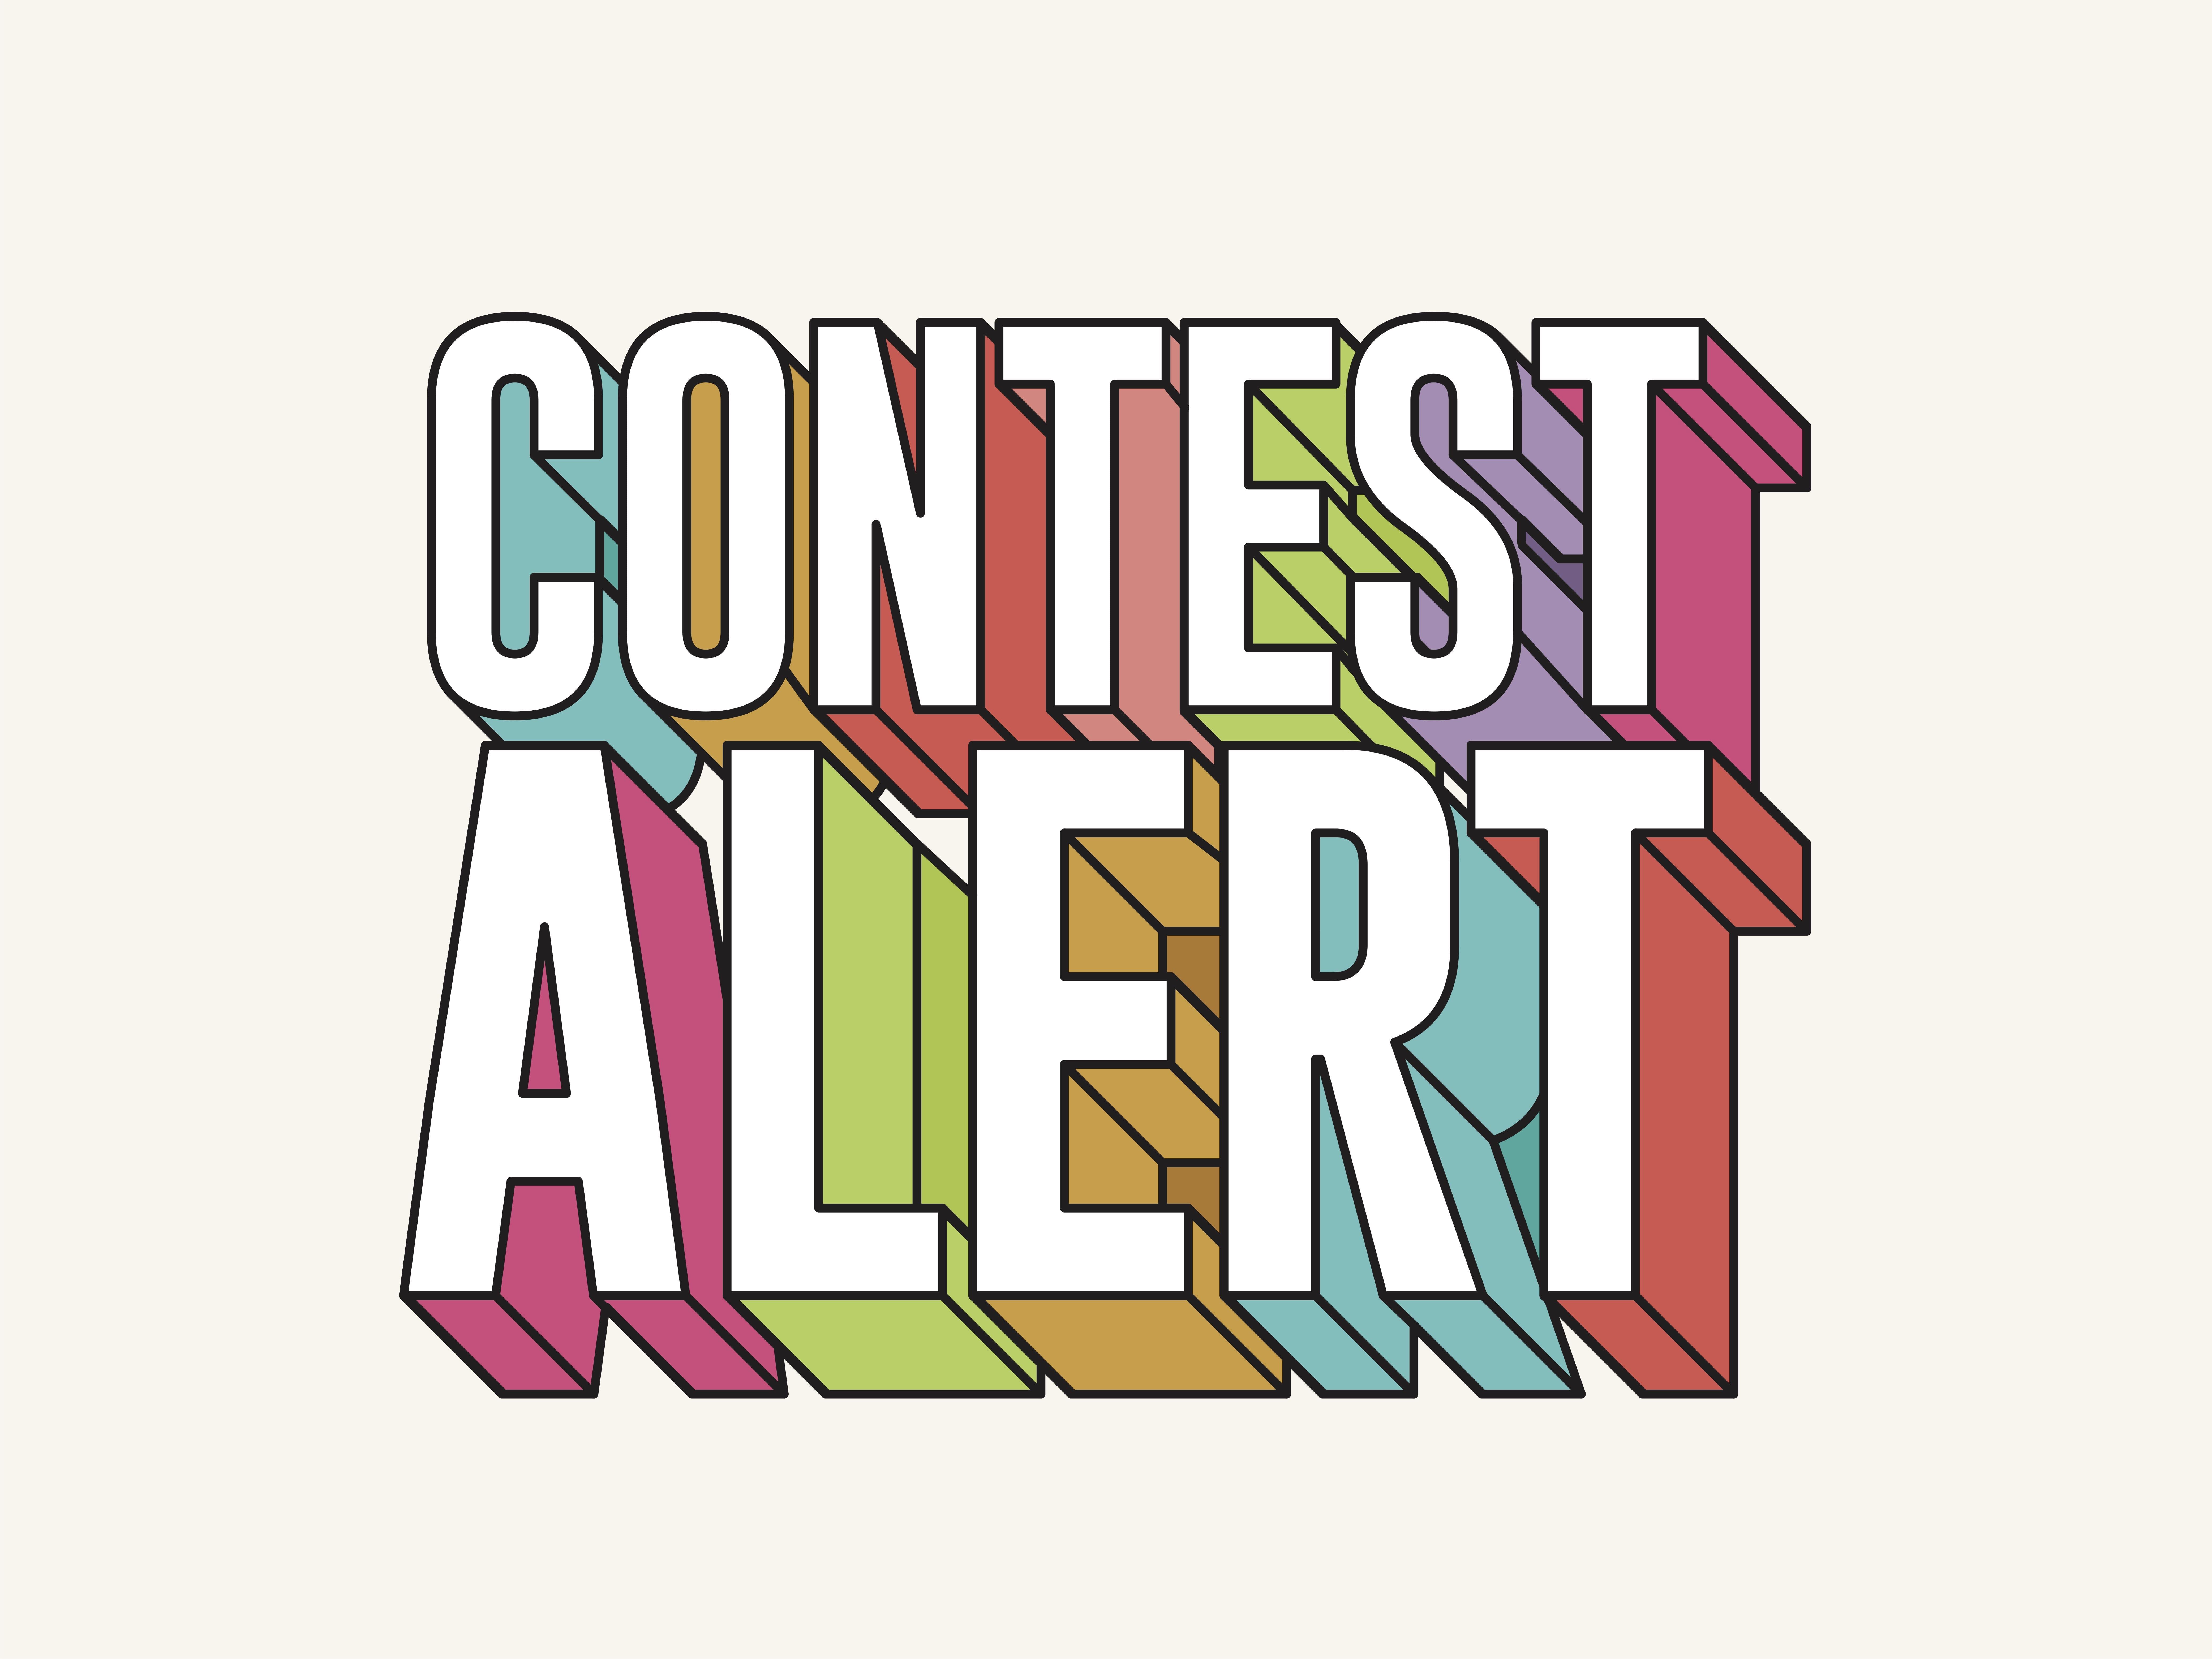 Contest online